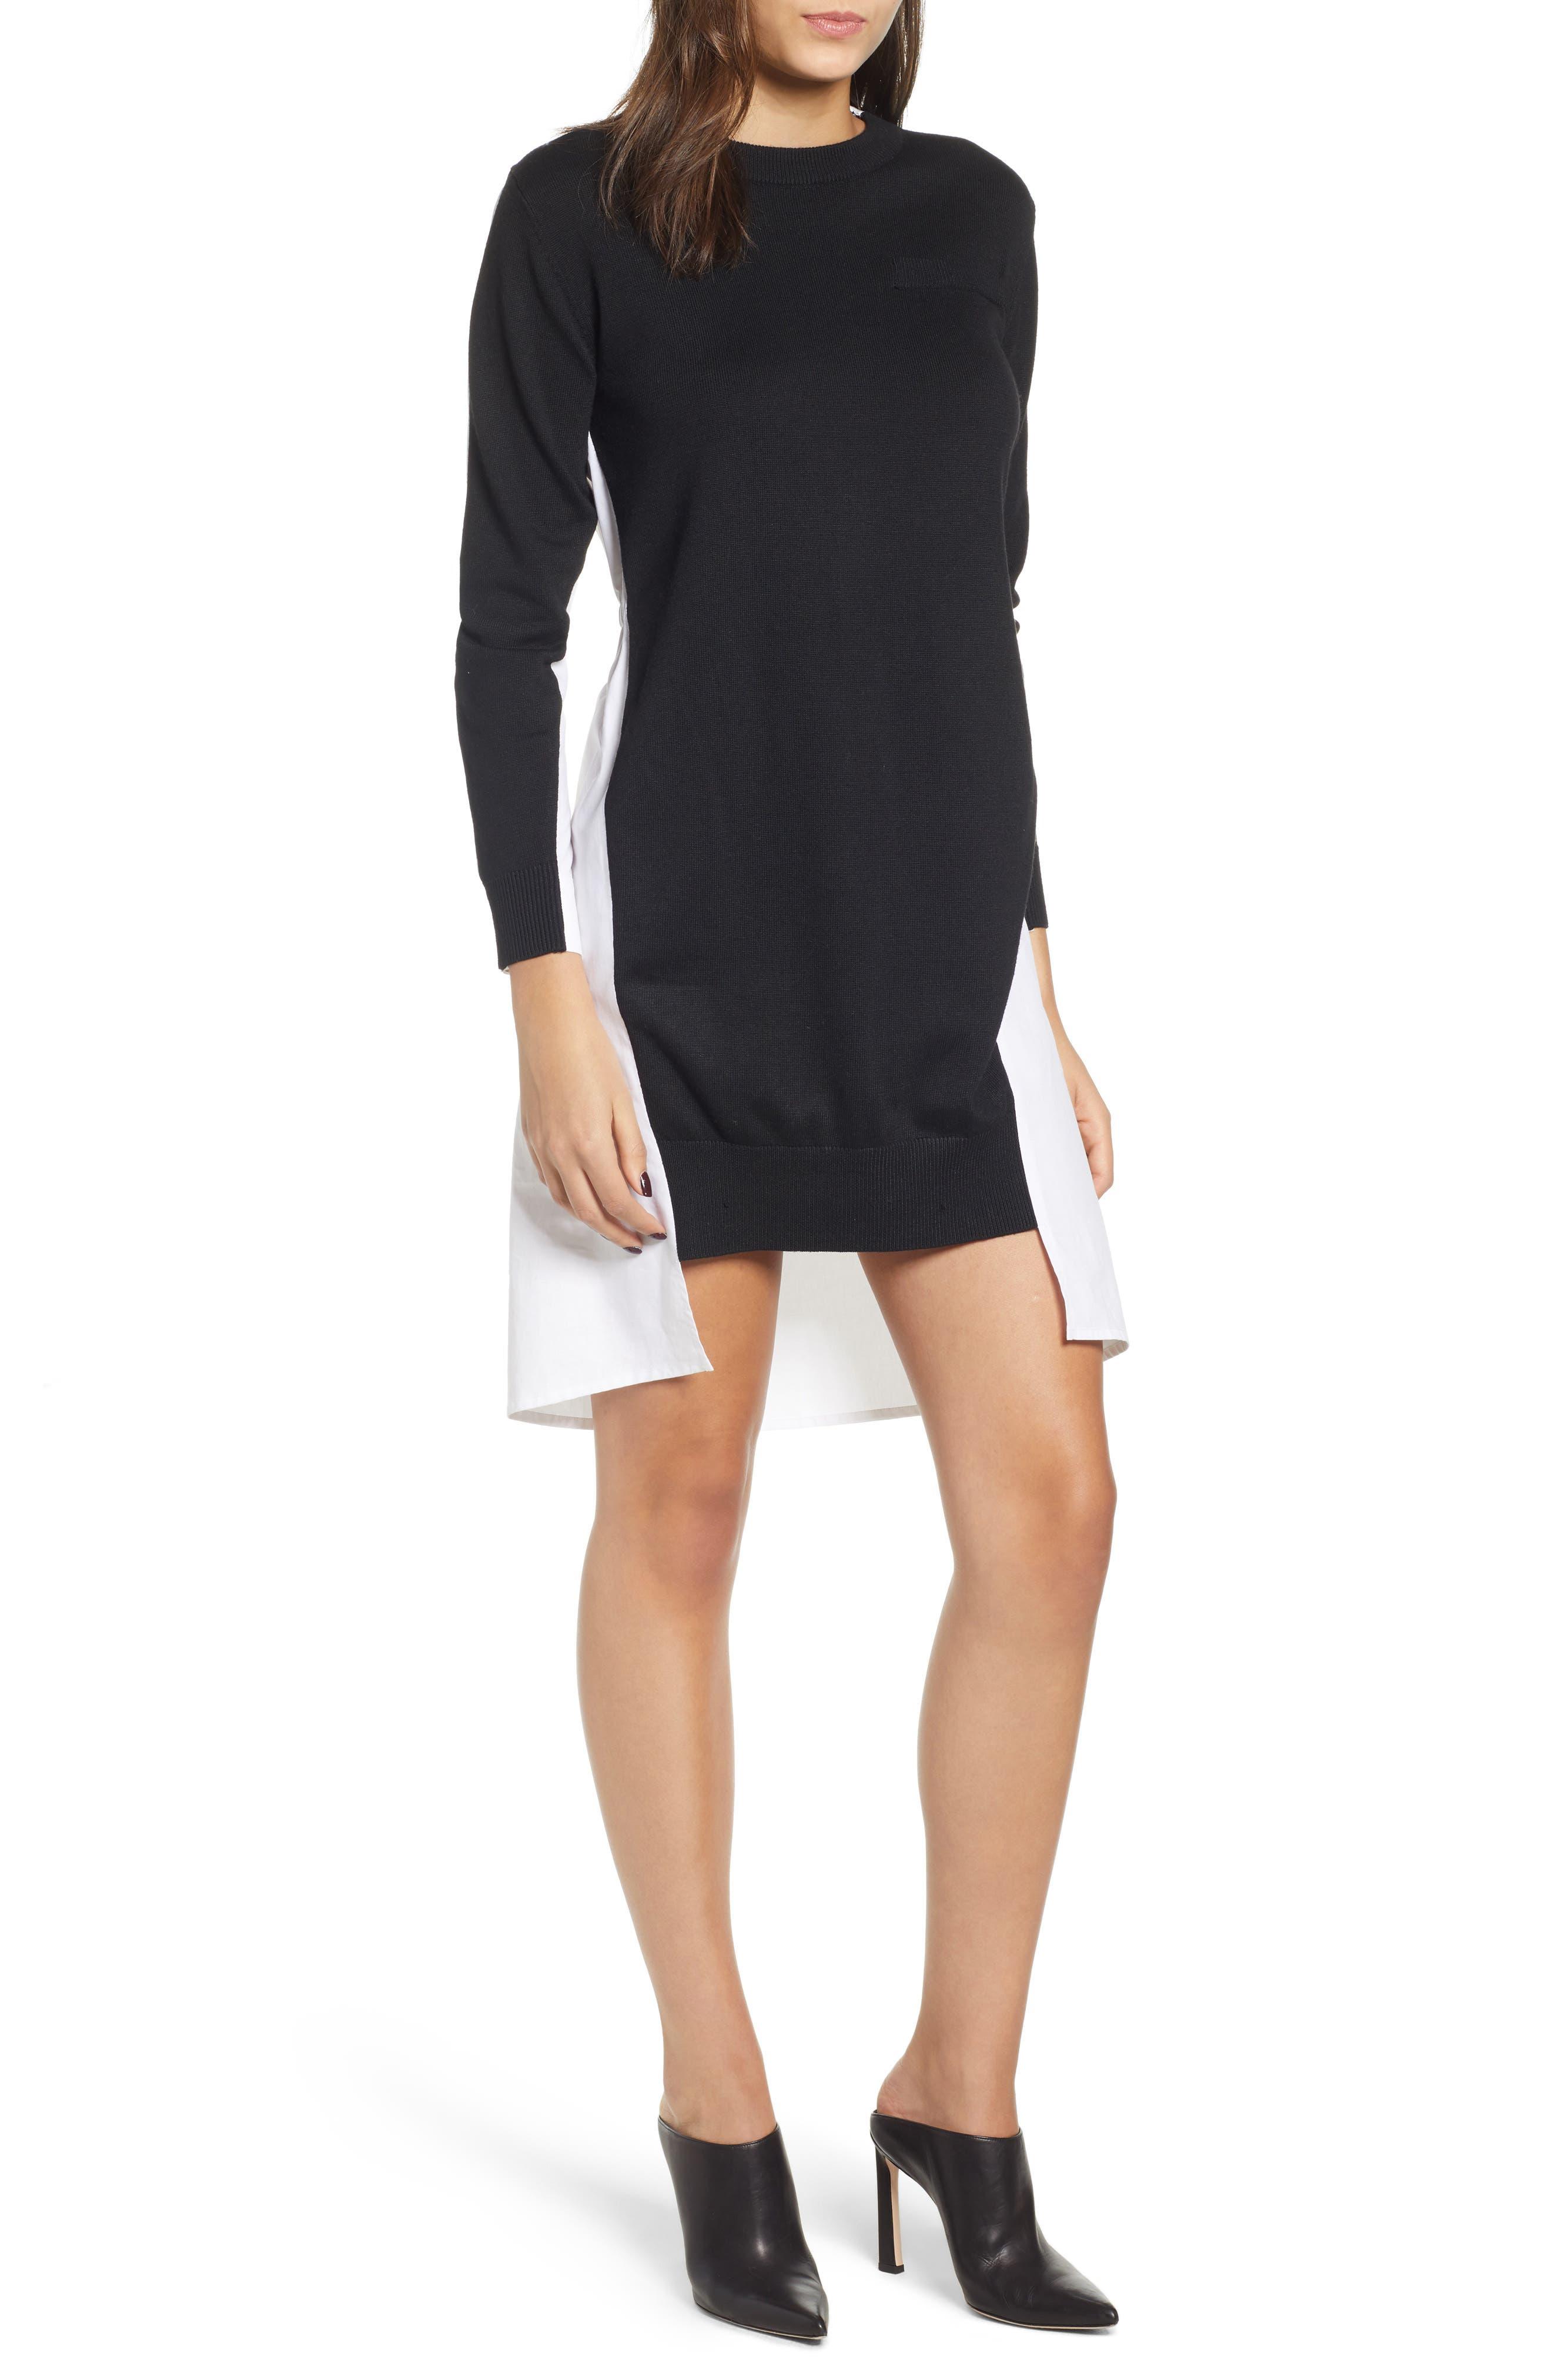 Combo Sweater Dress in Black